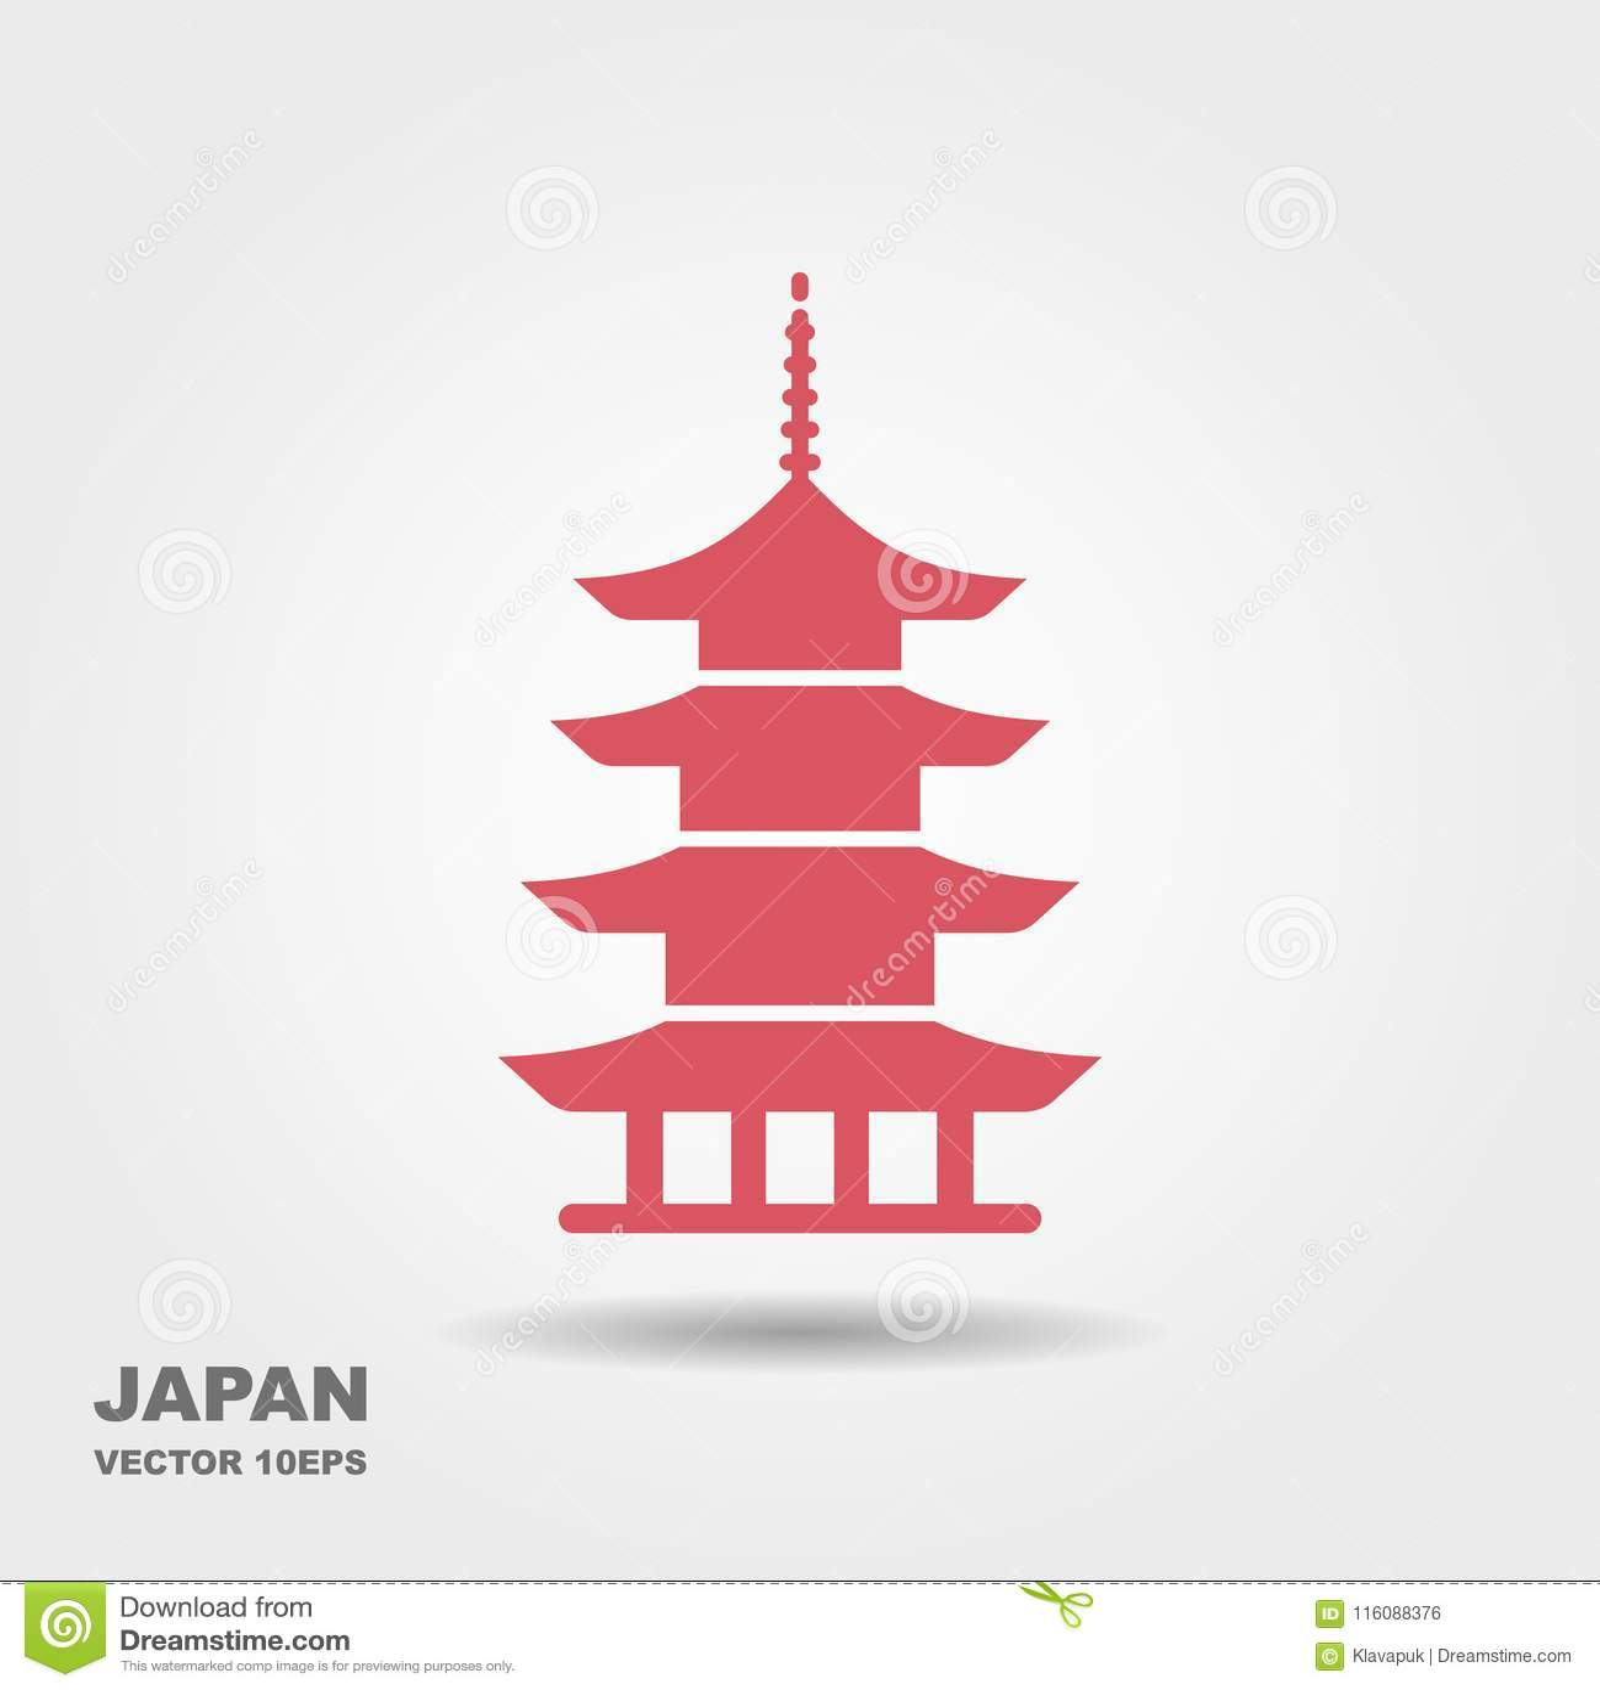 Japan Architecture Symbol Pagoda Stock Vector Illustration Of Asia